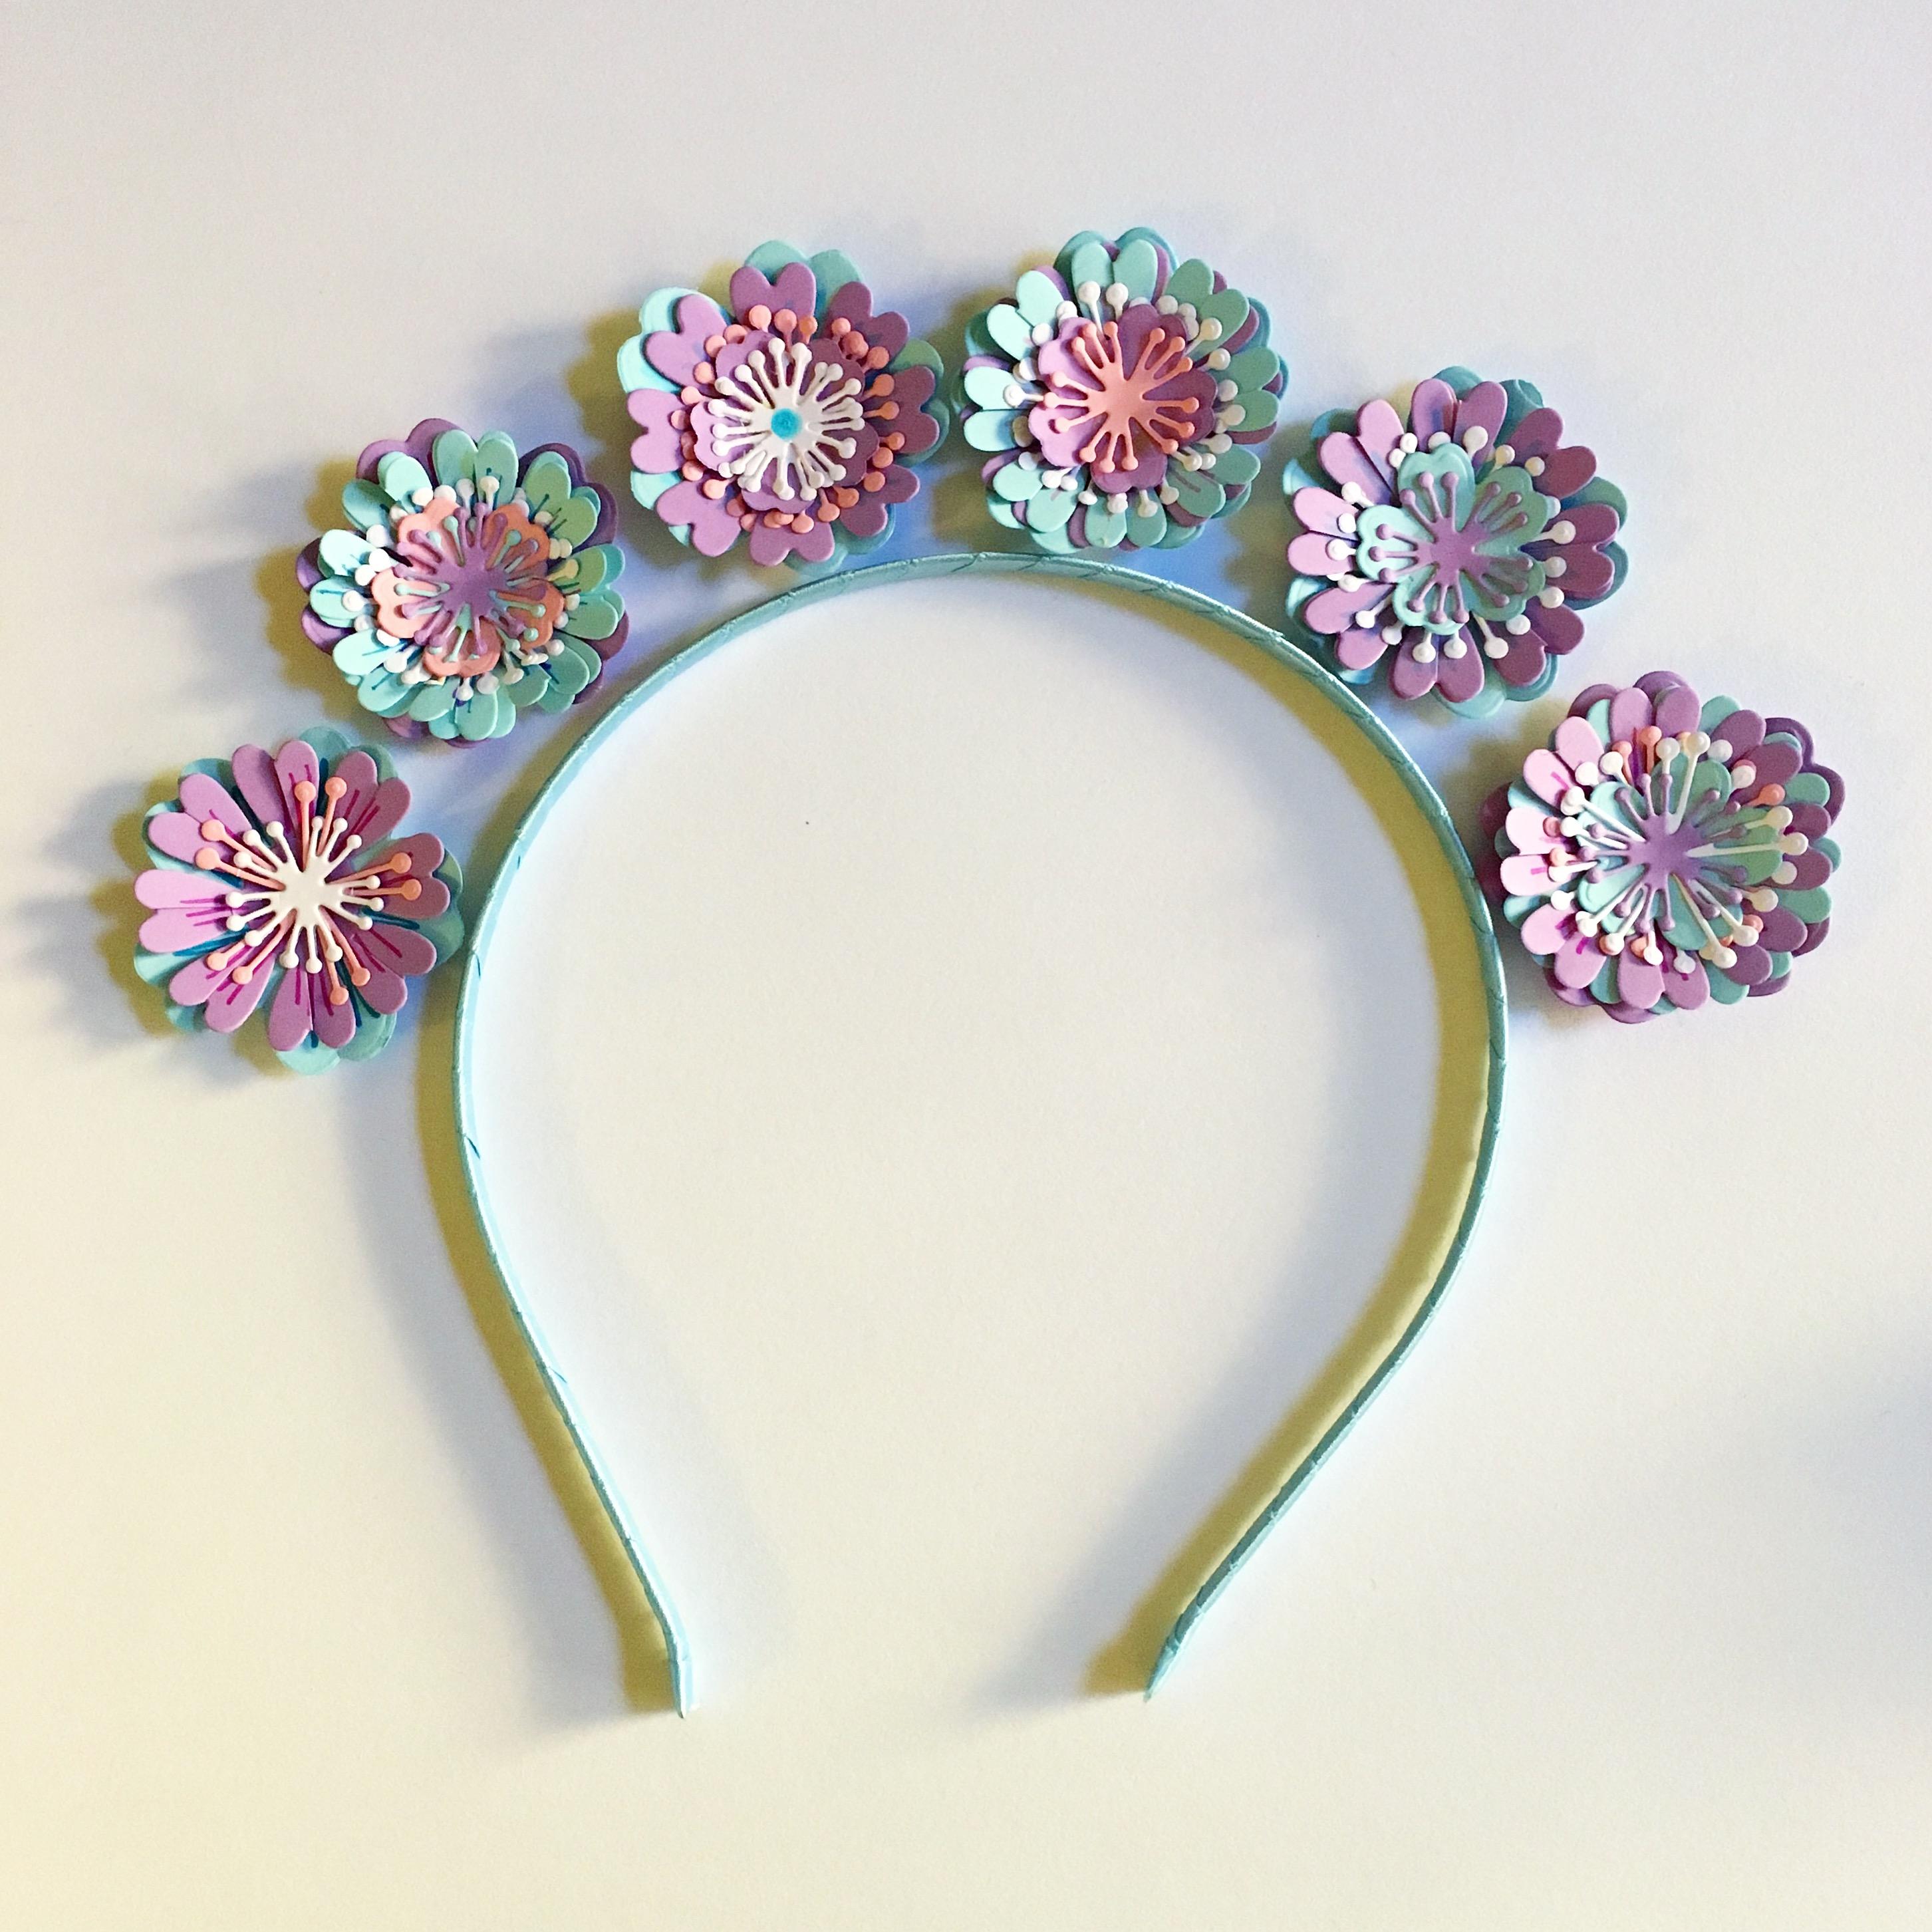 Easy to make girl's flower crown